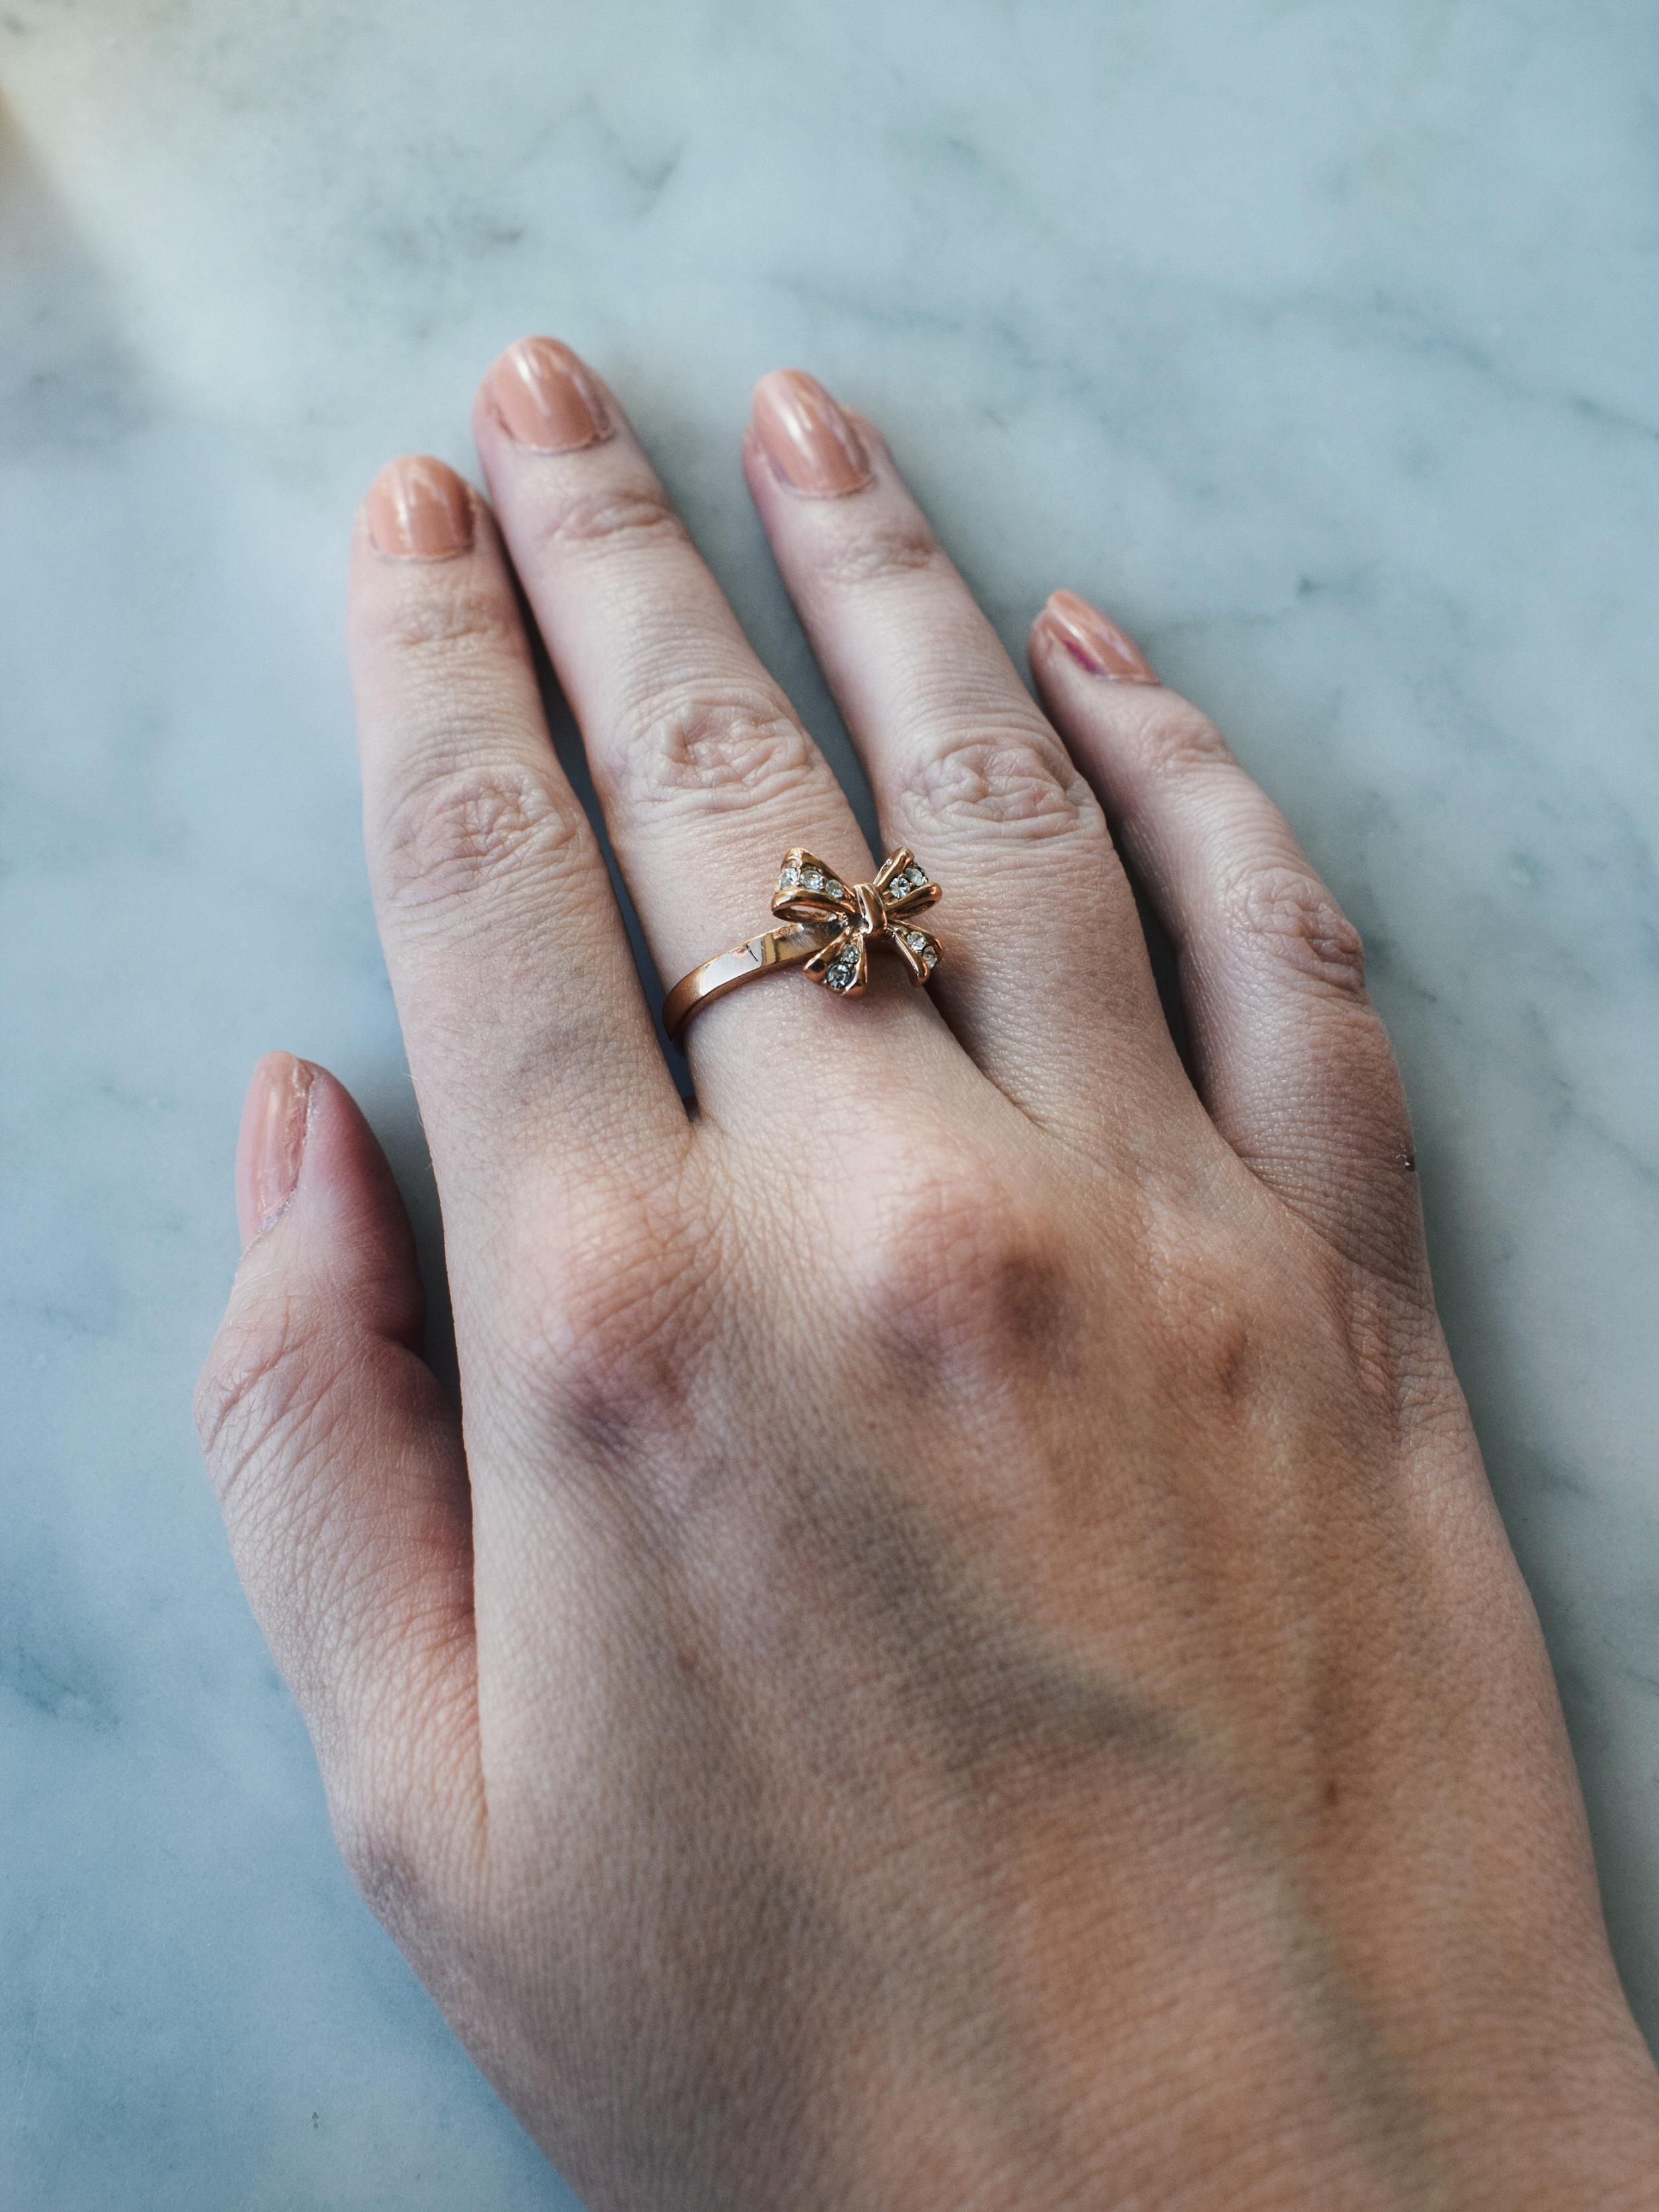 Outlandosh blog style essentials jewelry edition model ring